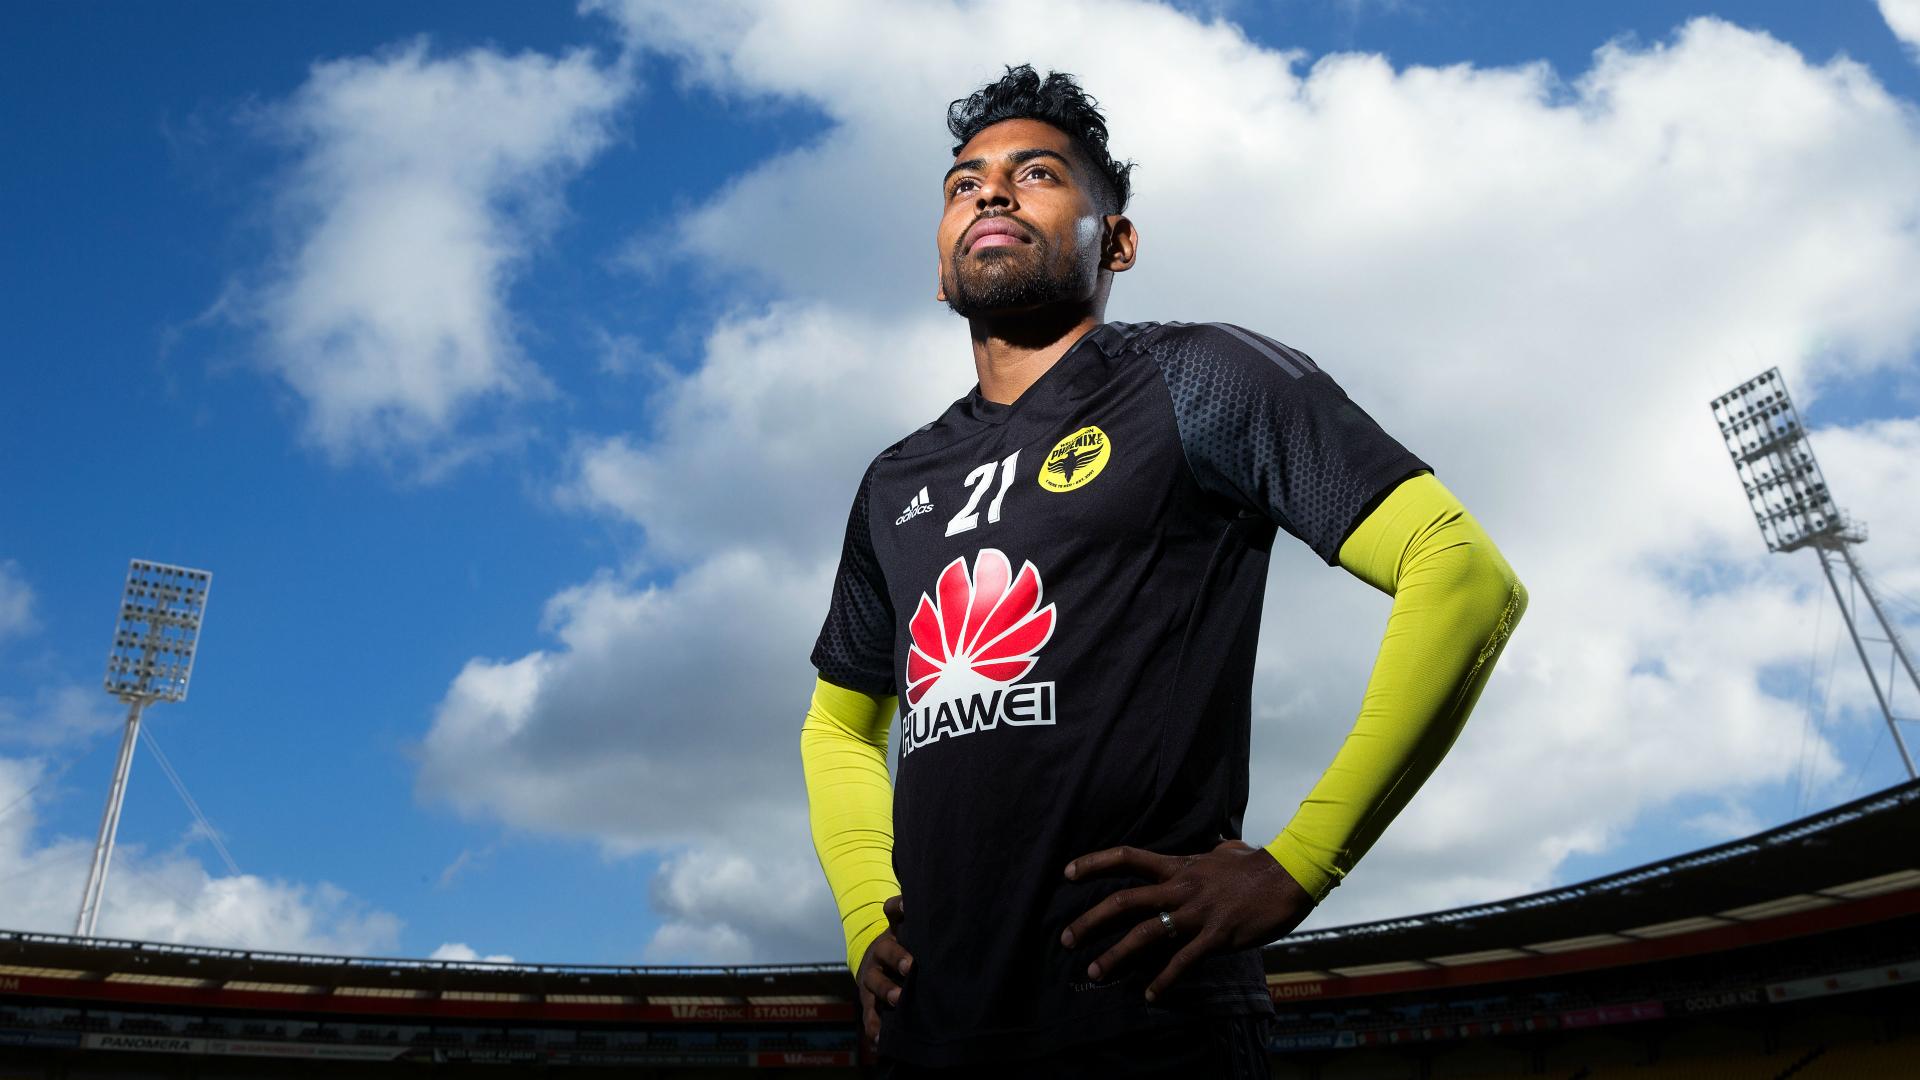 A-League and Australian football news LIVE: Krishna sets timeline for club decision